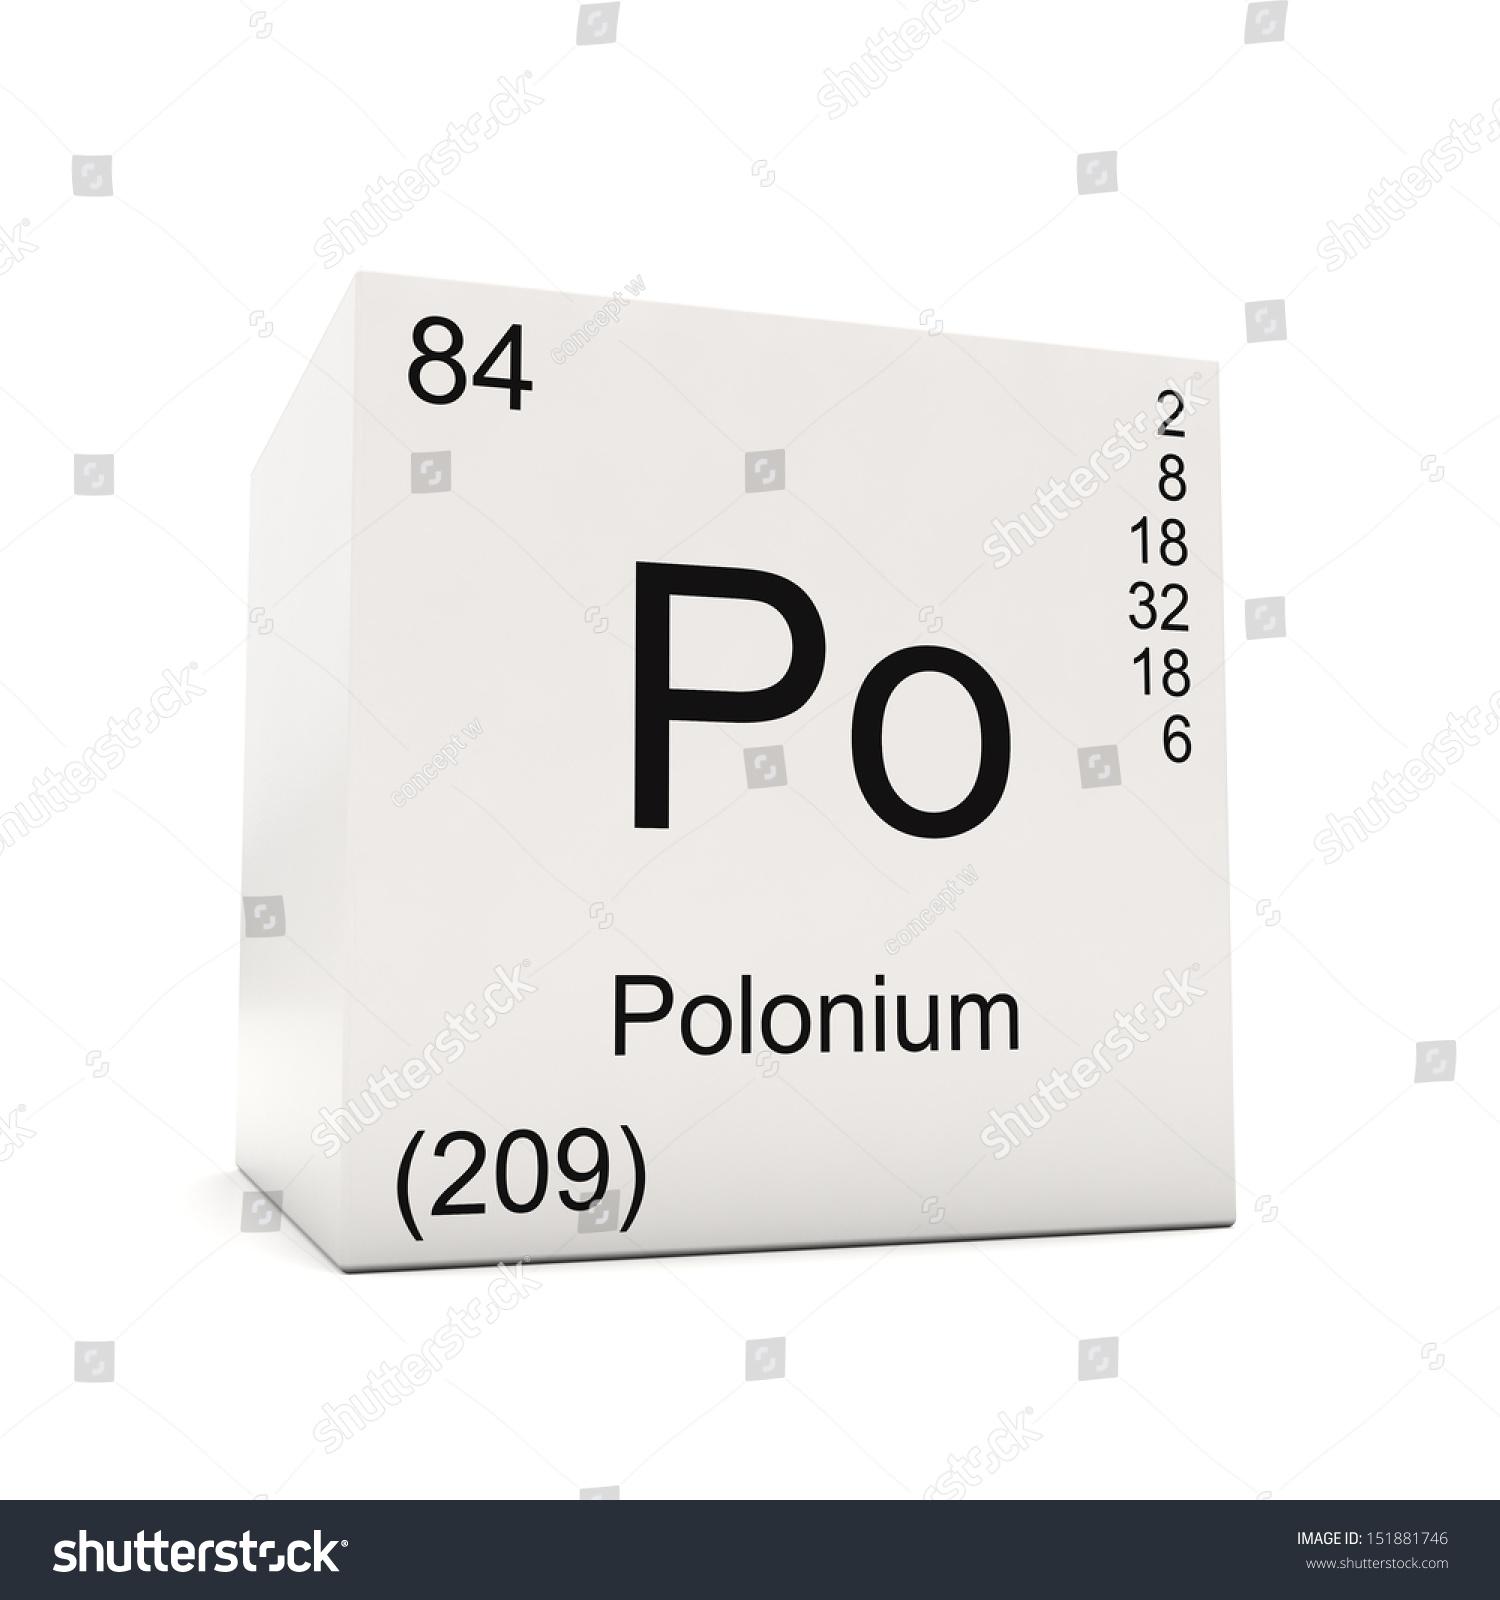 Cube polonium element periodic table isolated stock illustration cube of polonium element of the periodic table isolated on white background gamestrikefo Choice Image